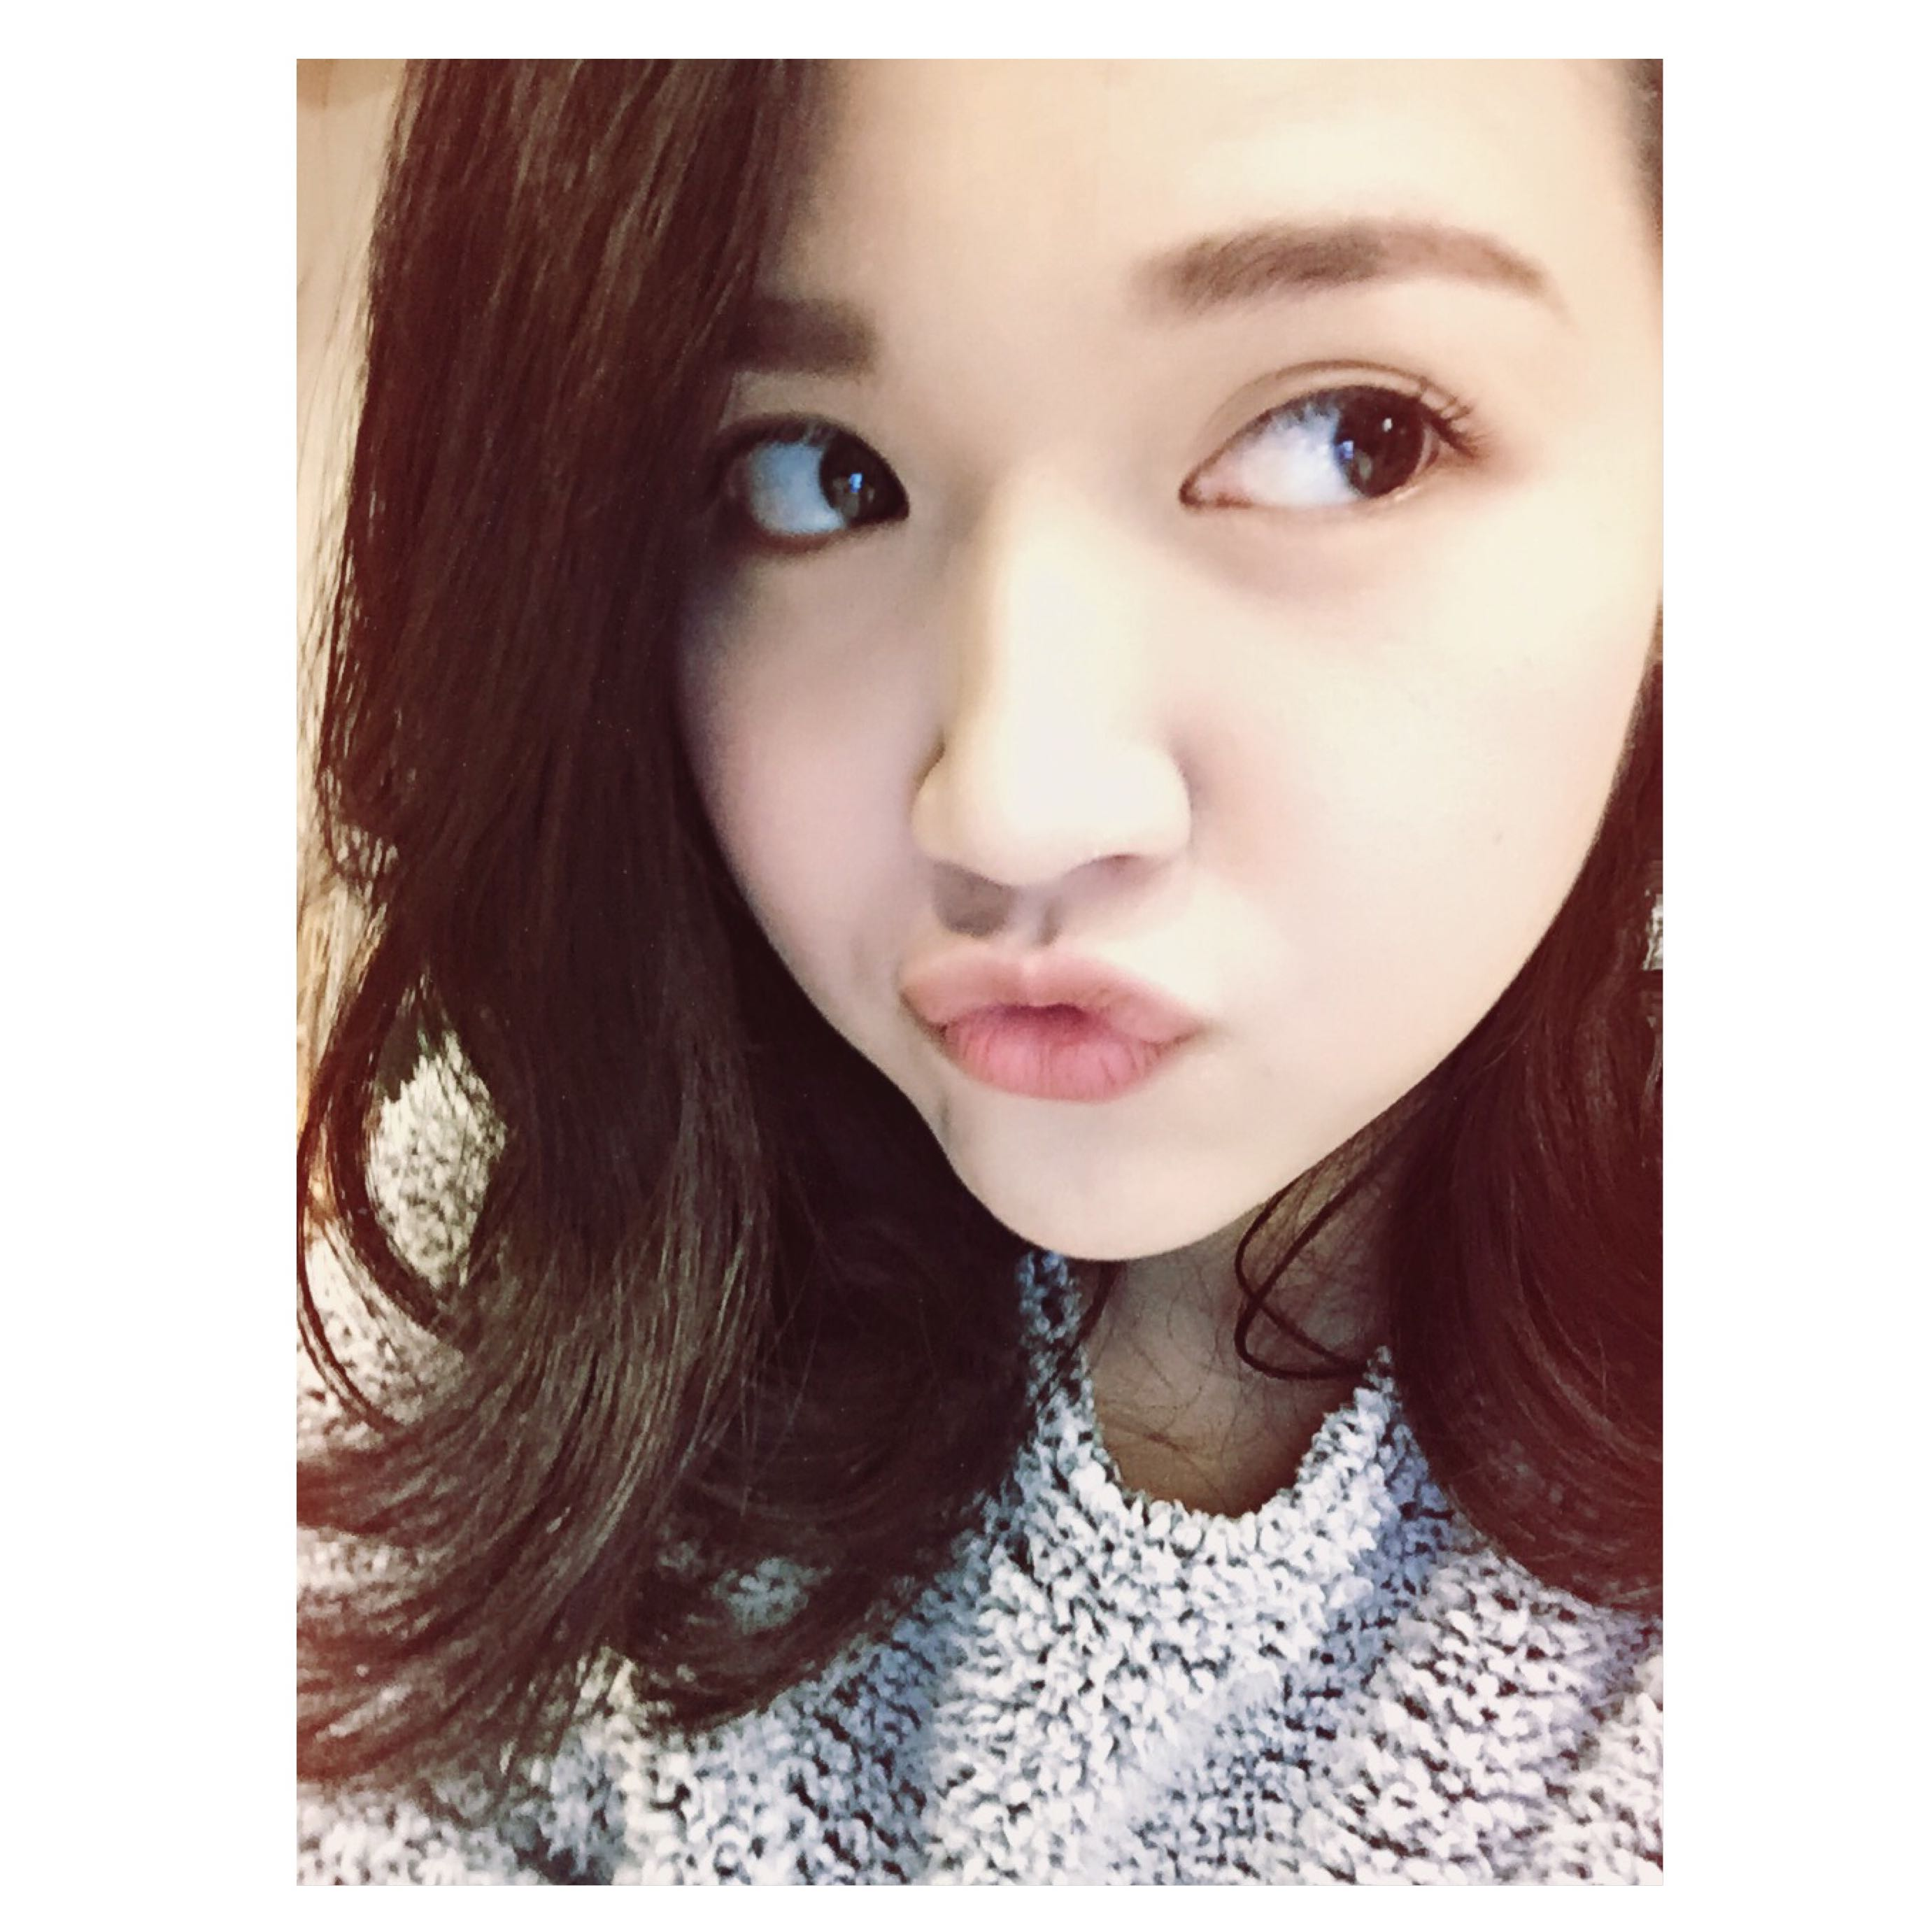 yuhsuanwoo